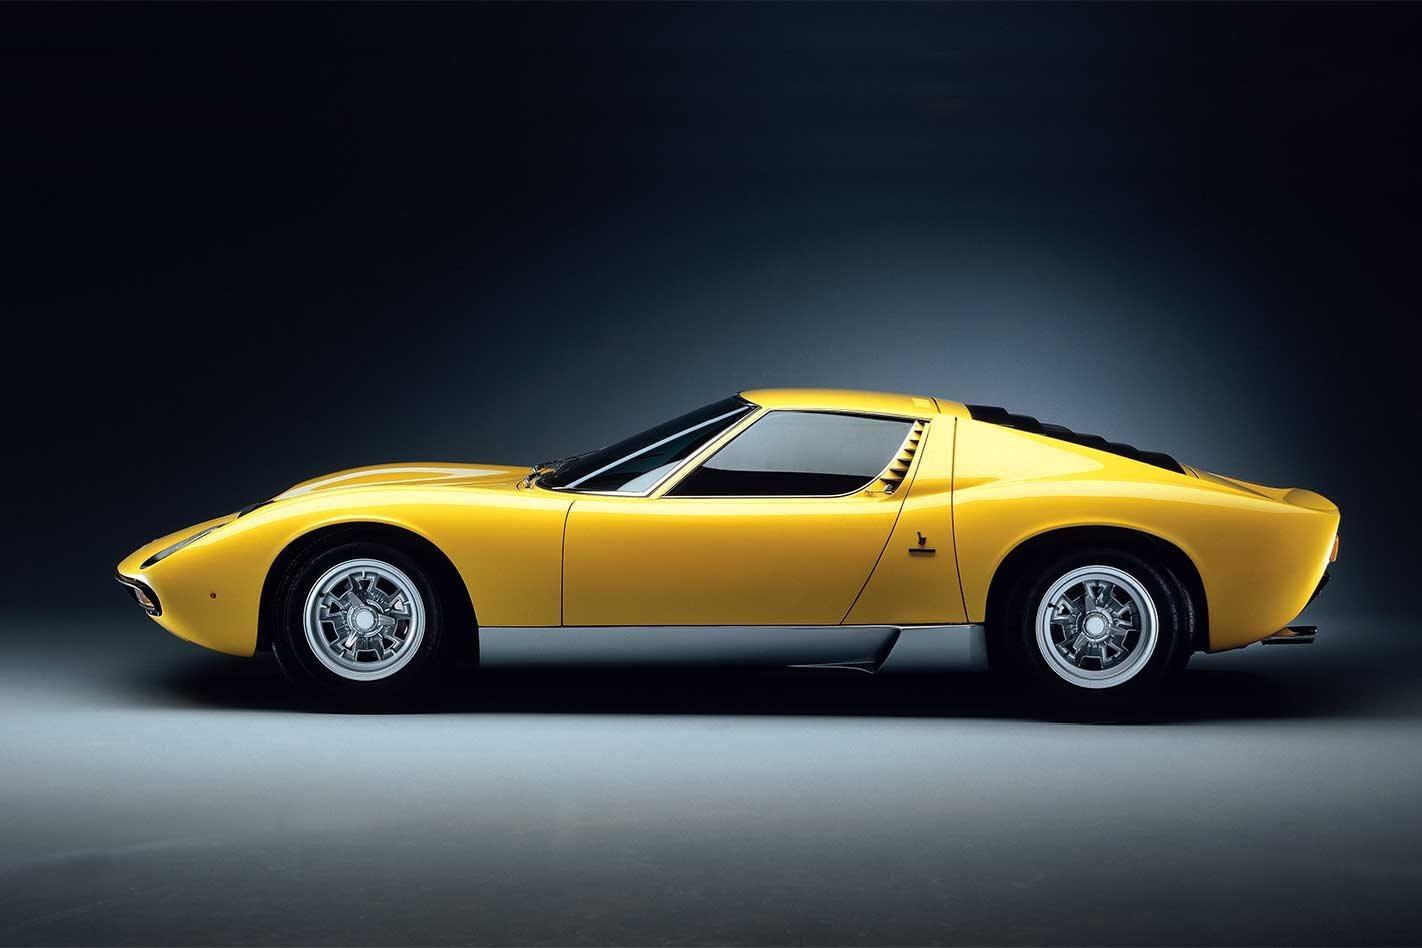 1971 Lamborghini Miura SV Feature Jpg